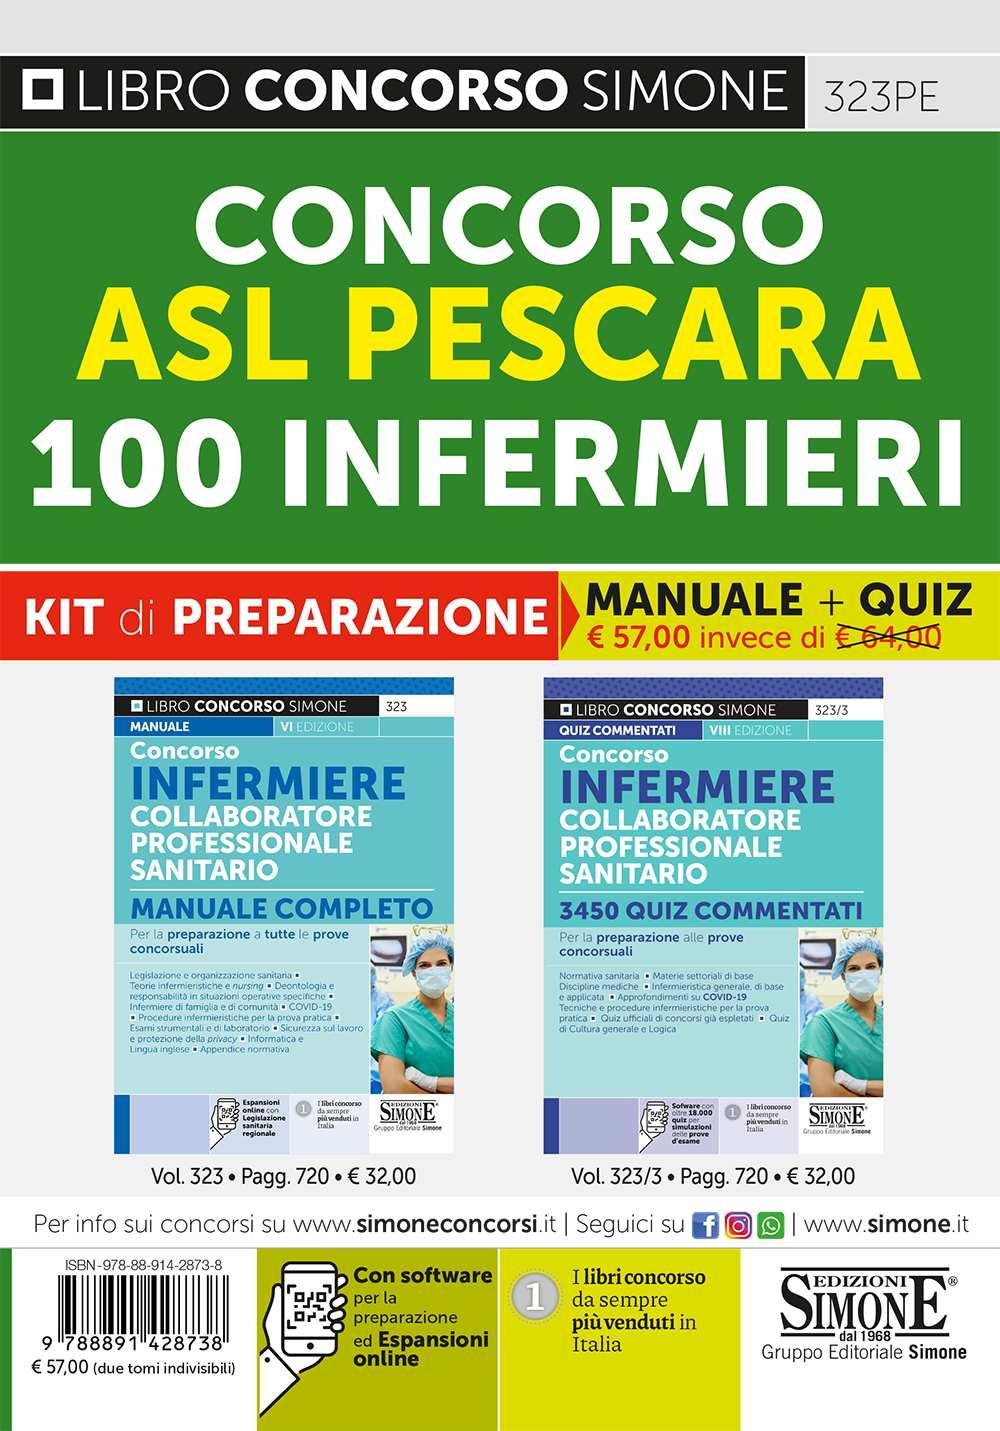 Concorso infermieri ASL Pescara